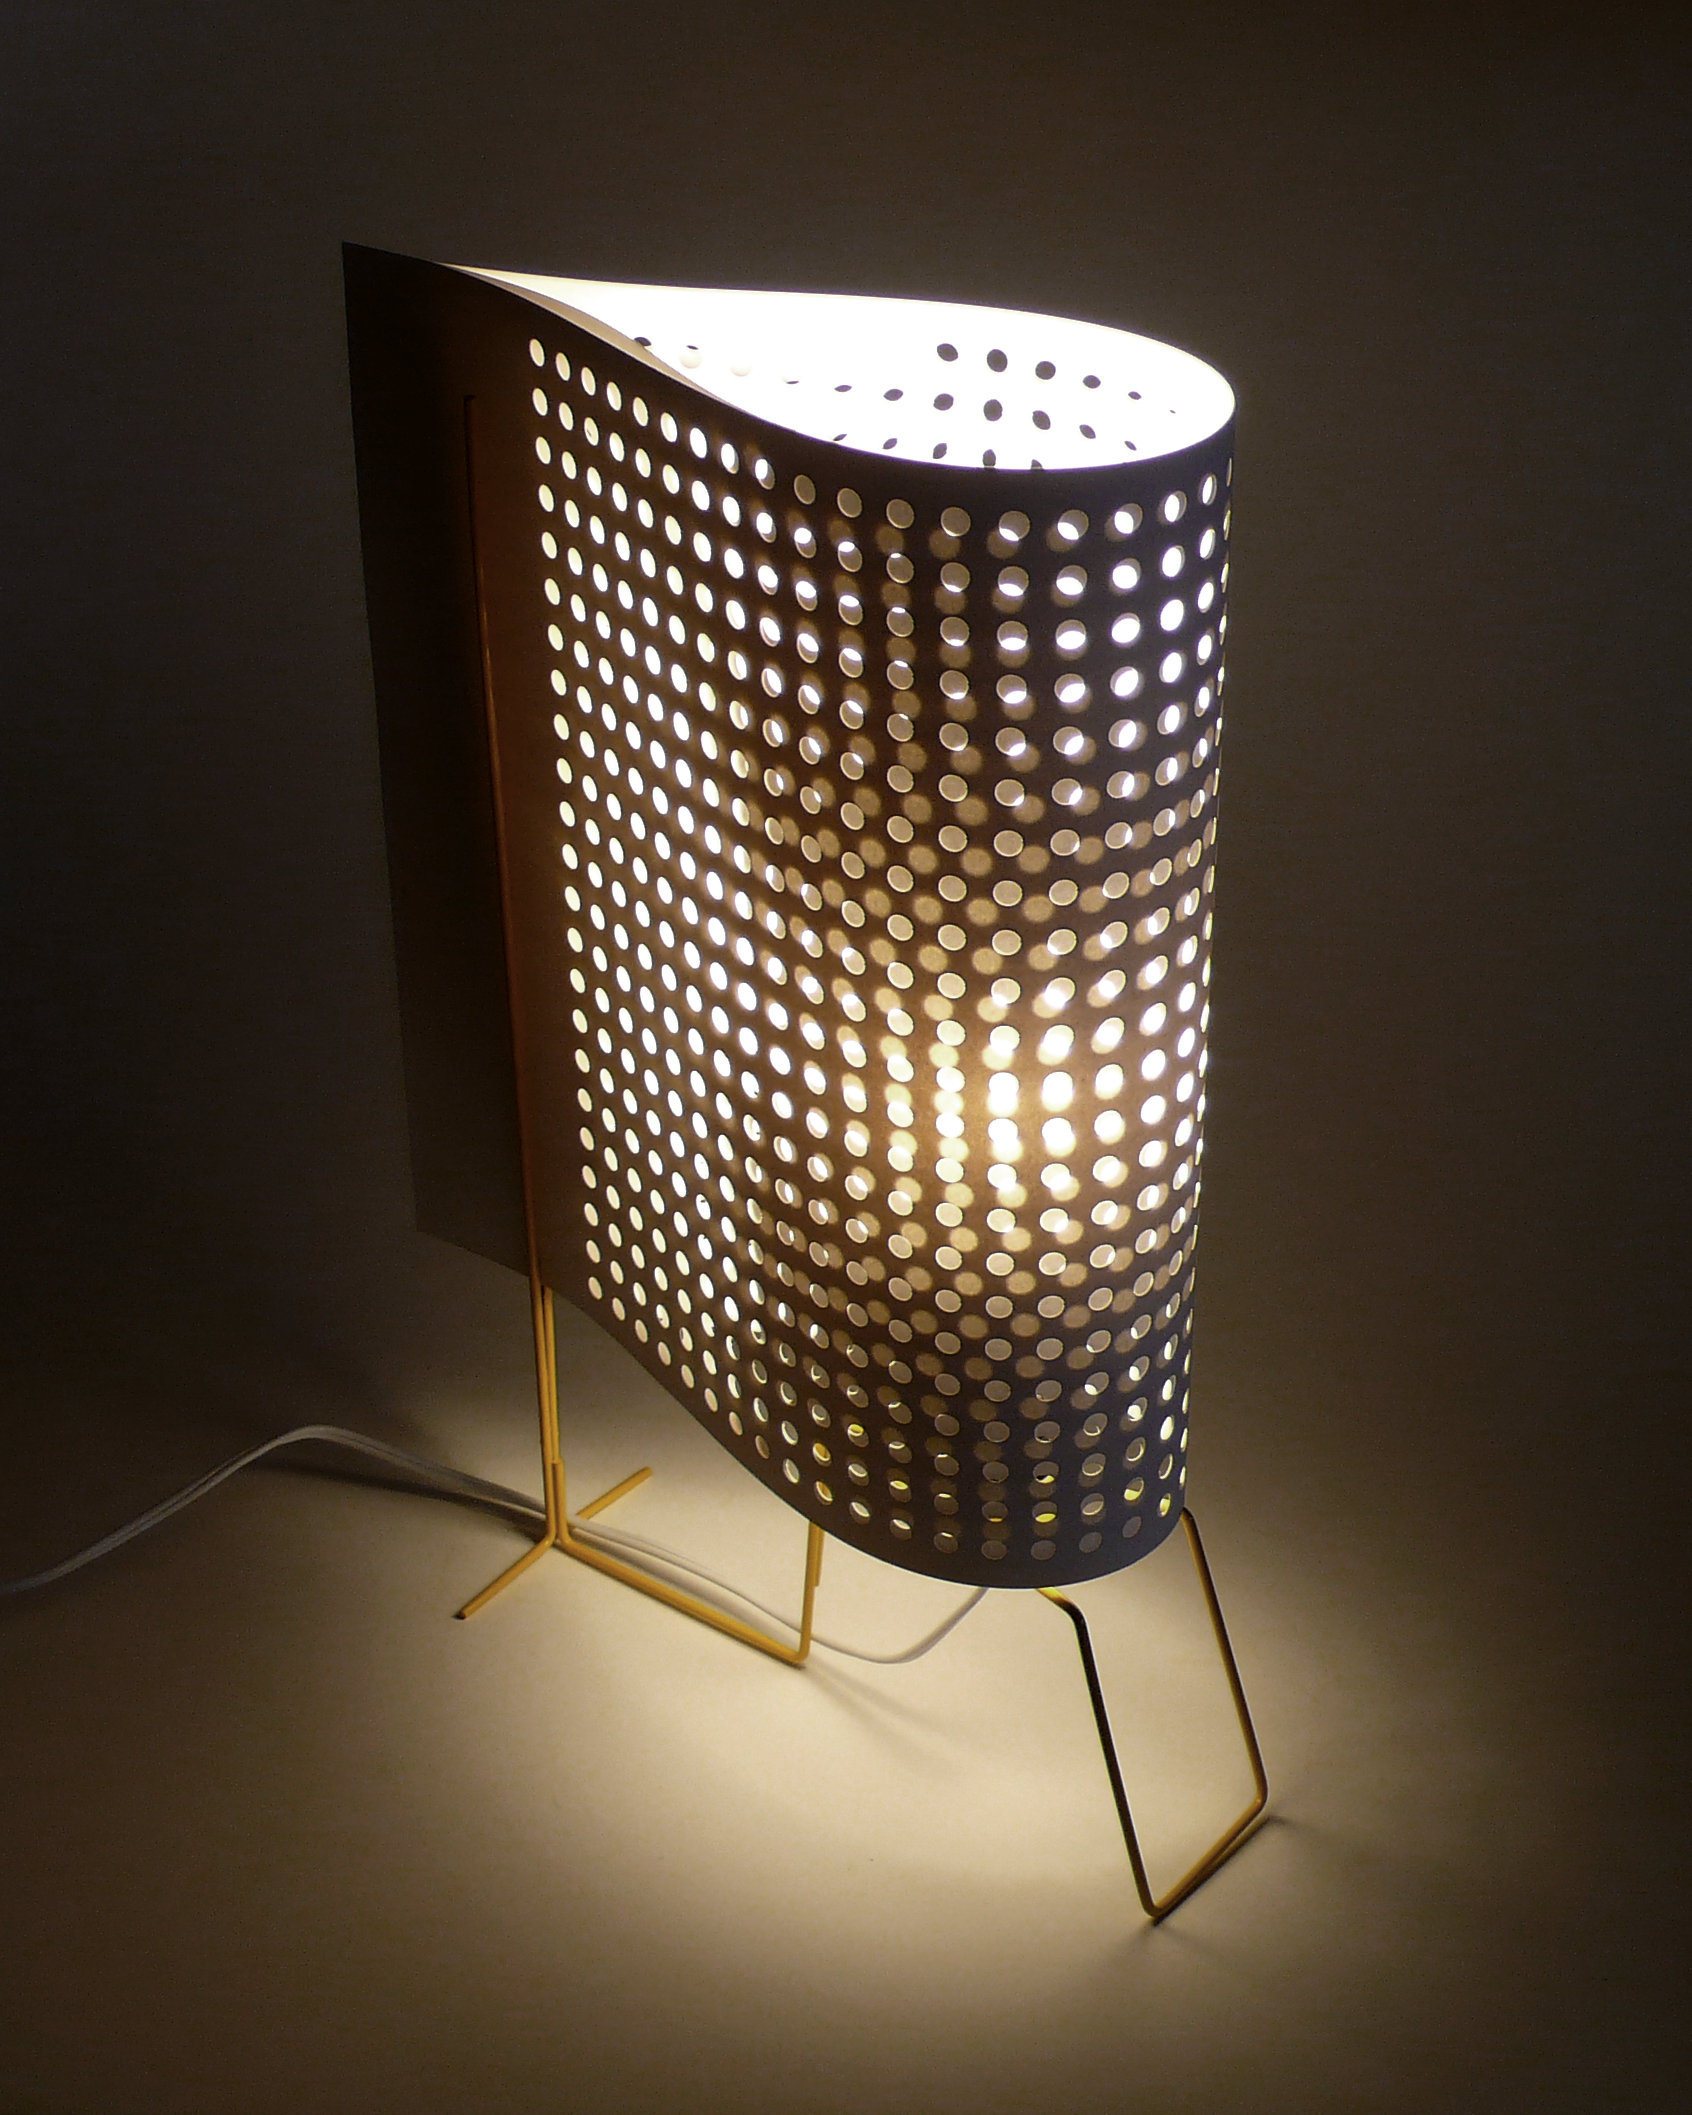 10 benefits of Laser cut lamps | Warisan Lighting